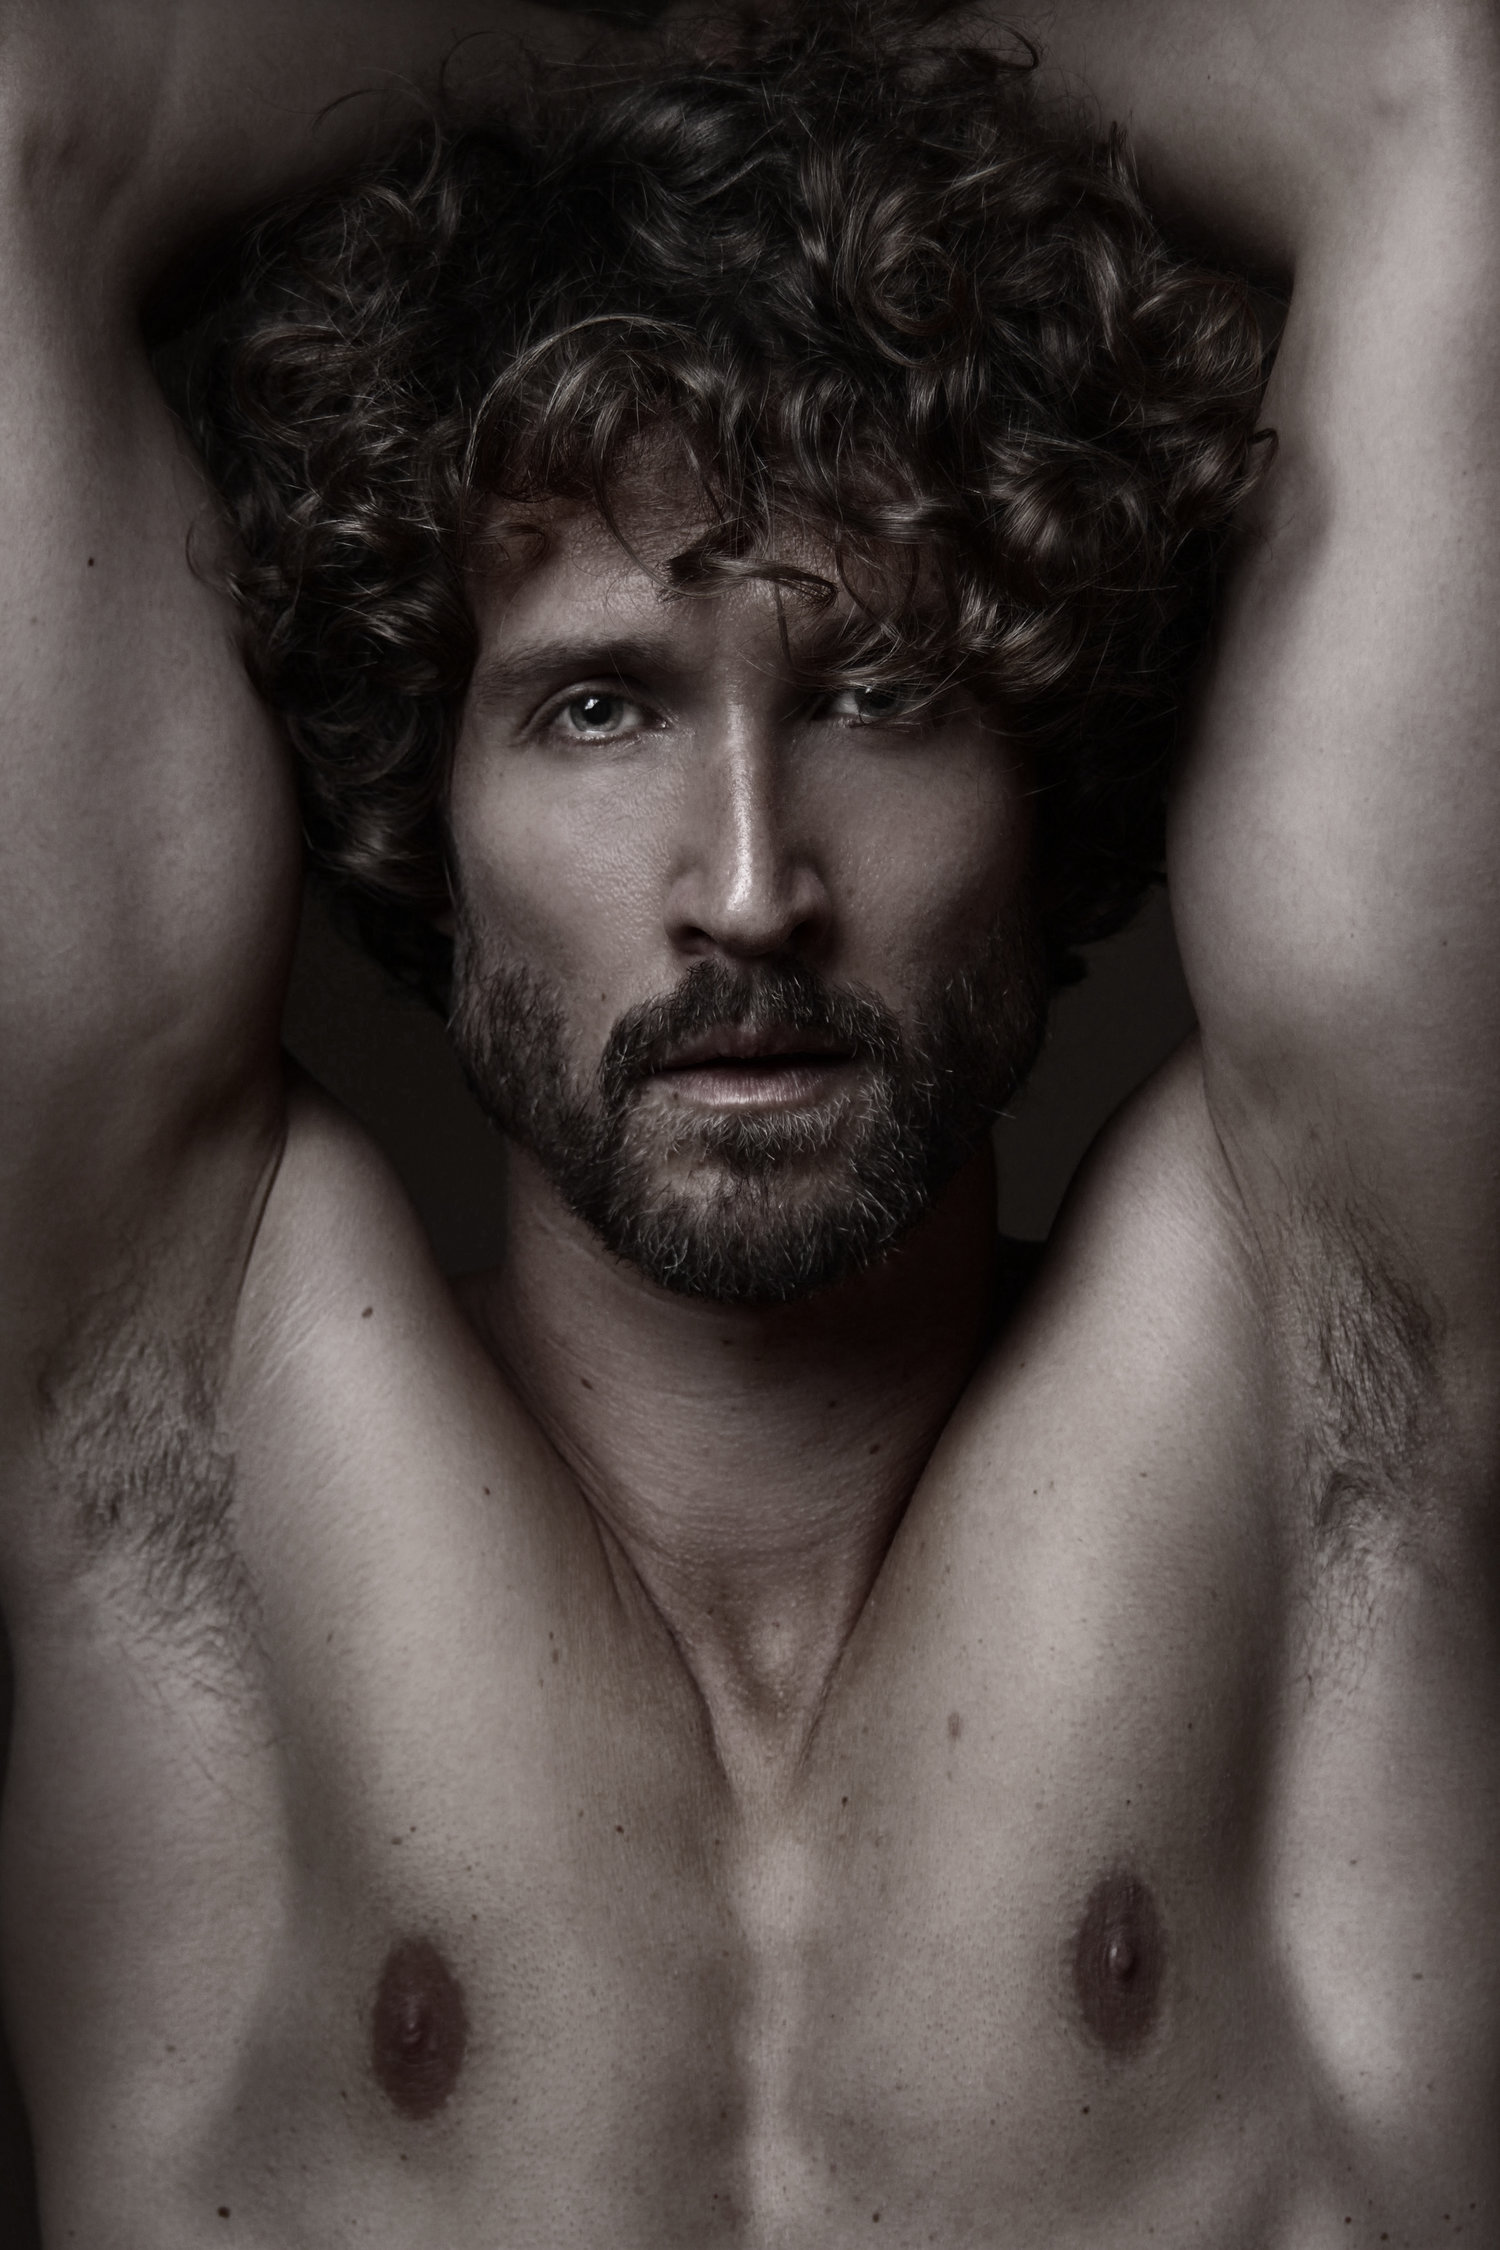 Adon Exclusive: Model Erik Reisinger By NIK PATE